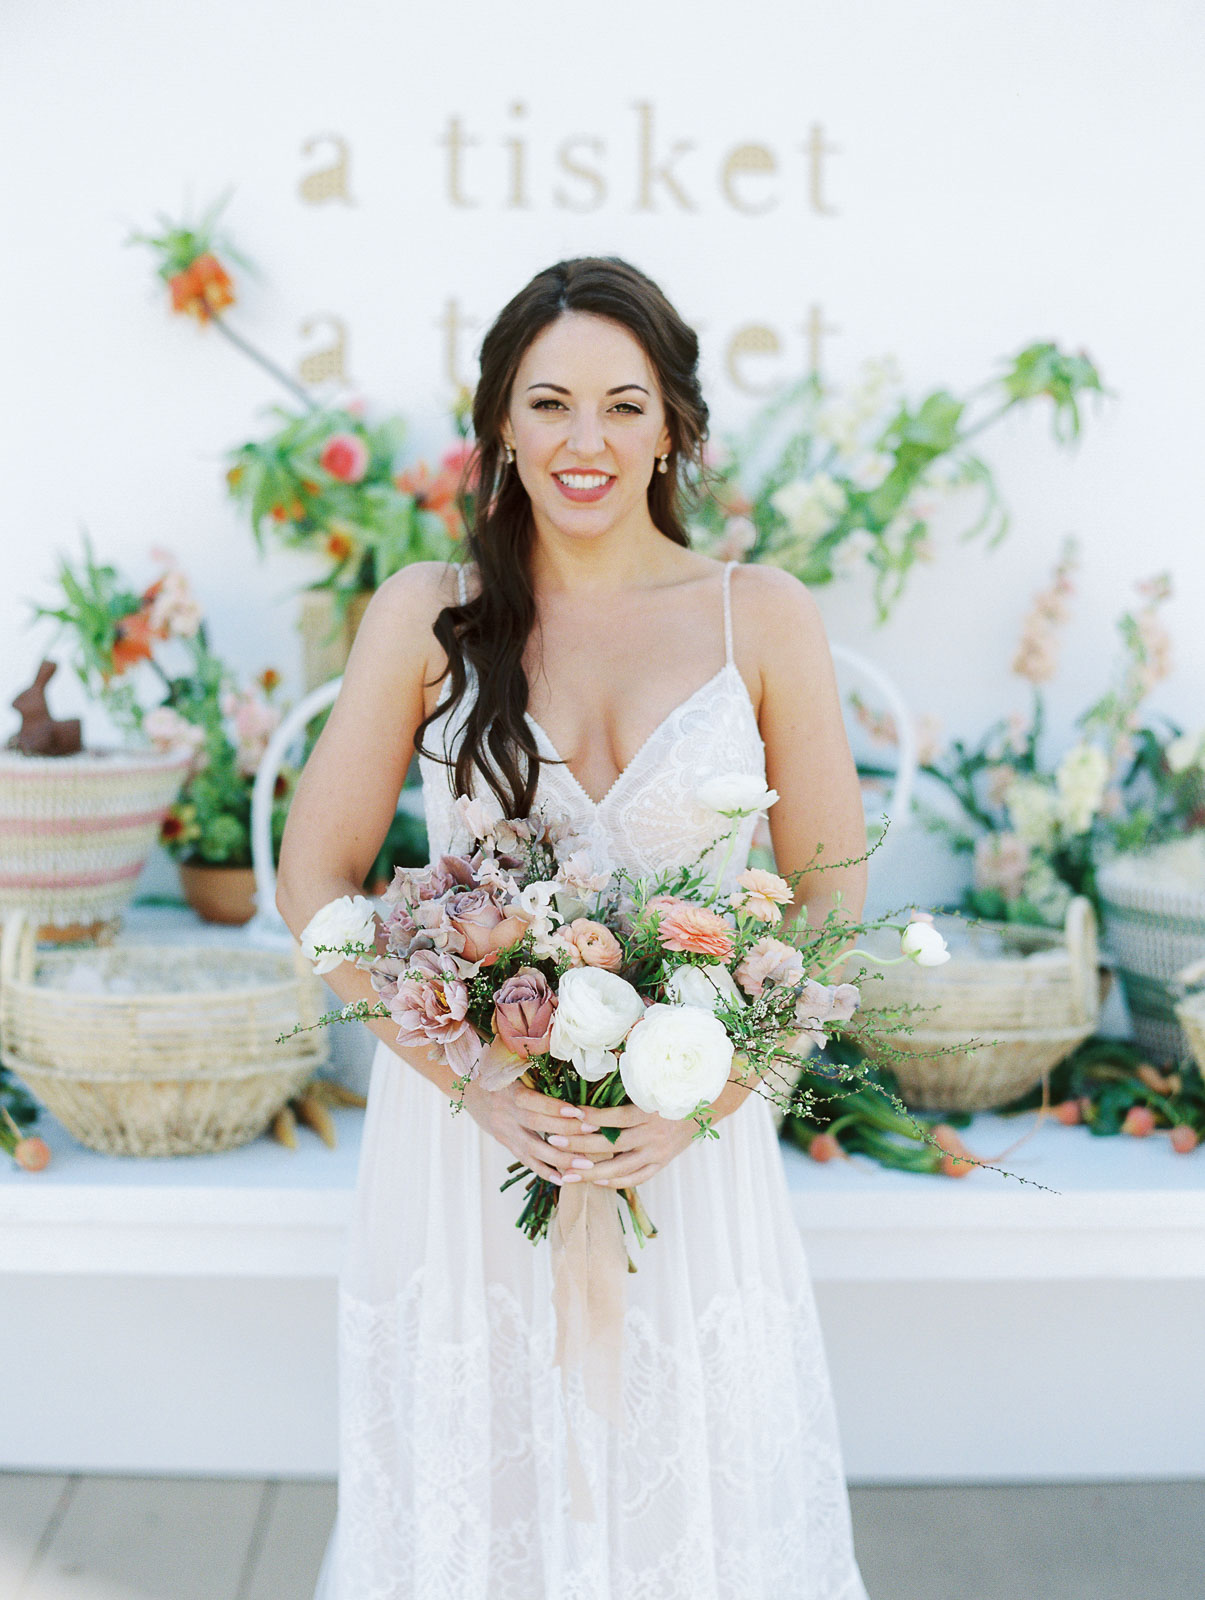 bride holding pastel colored flowers wedding bouquet